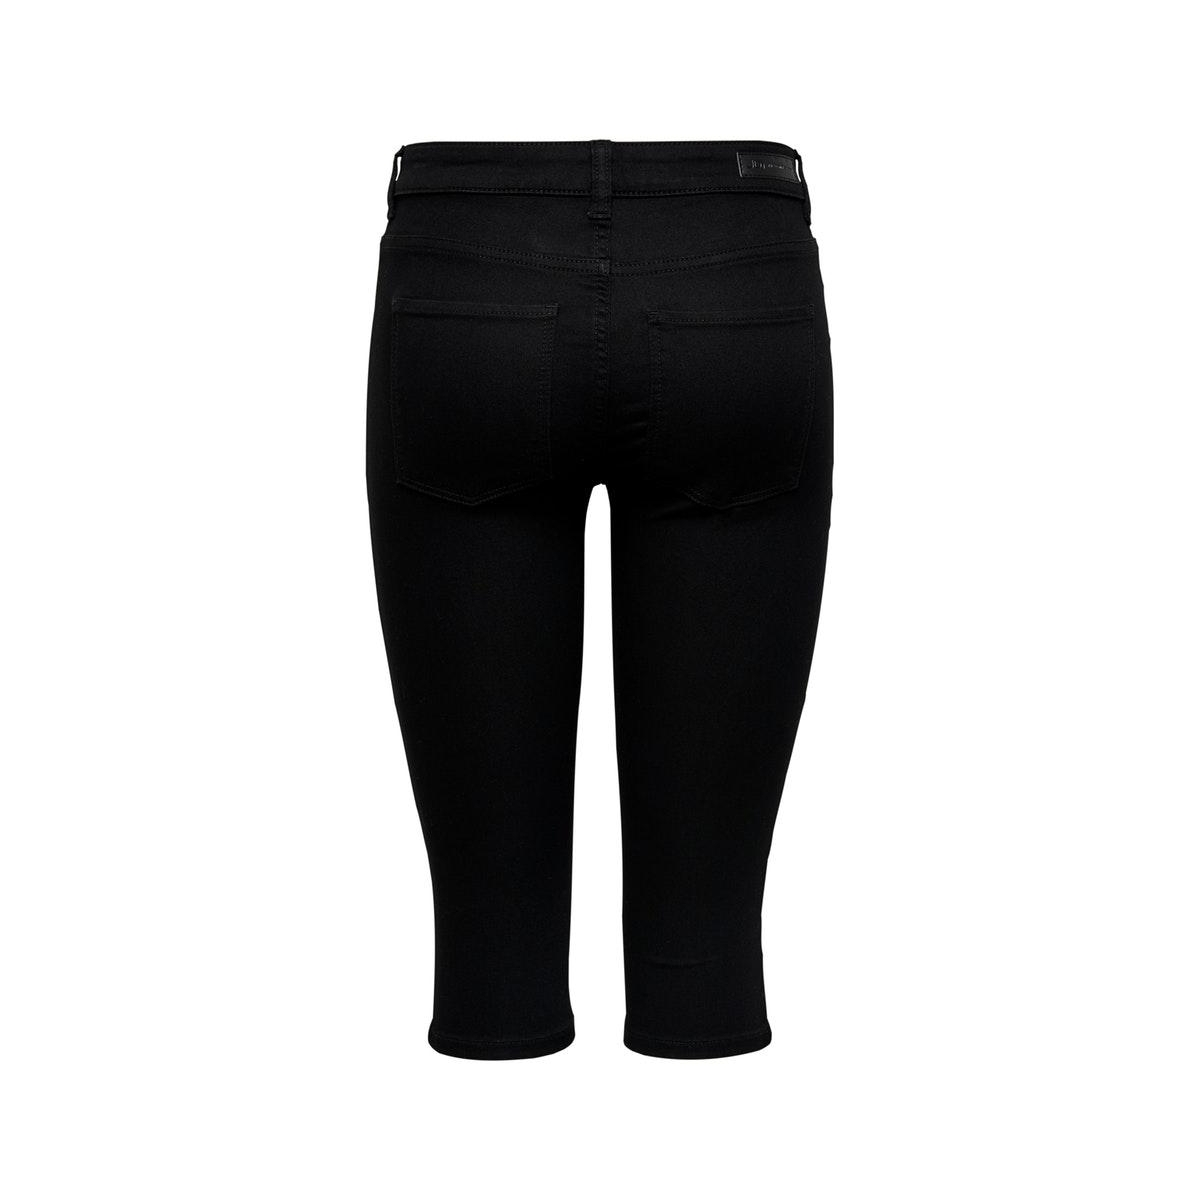 jdynikki knickers treats mix dnm 15200799 jacqueline de yong jeans black